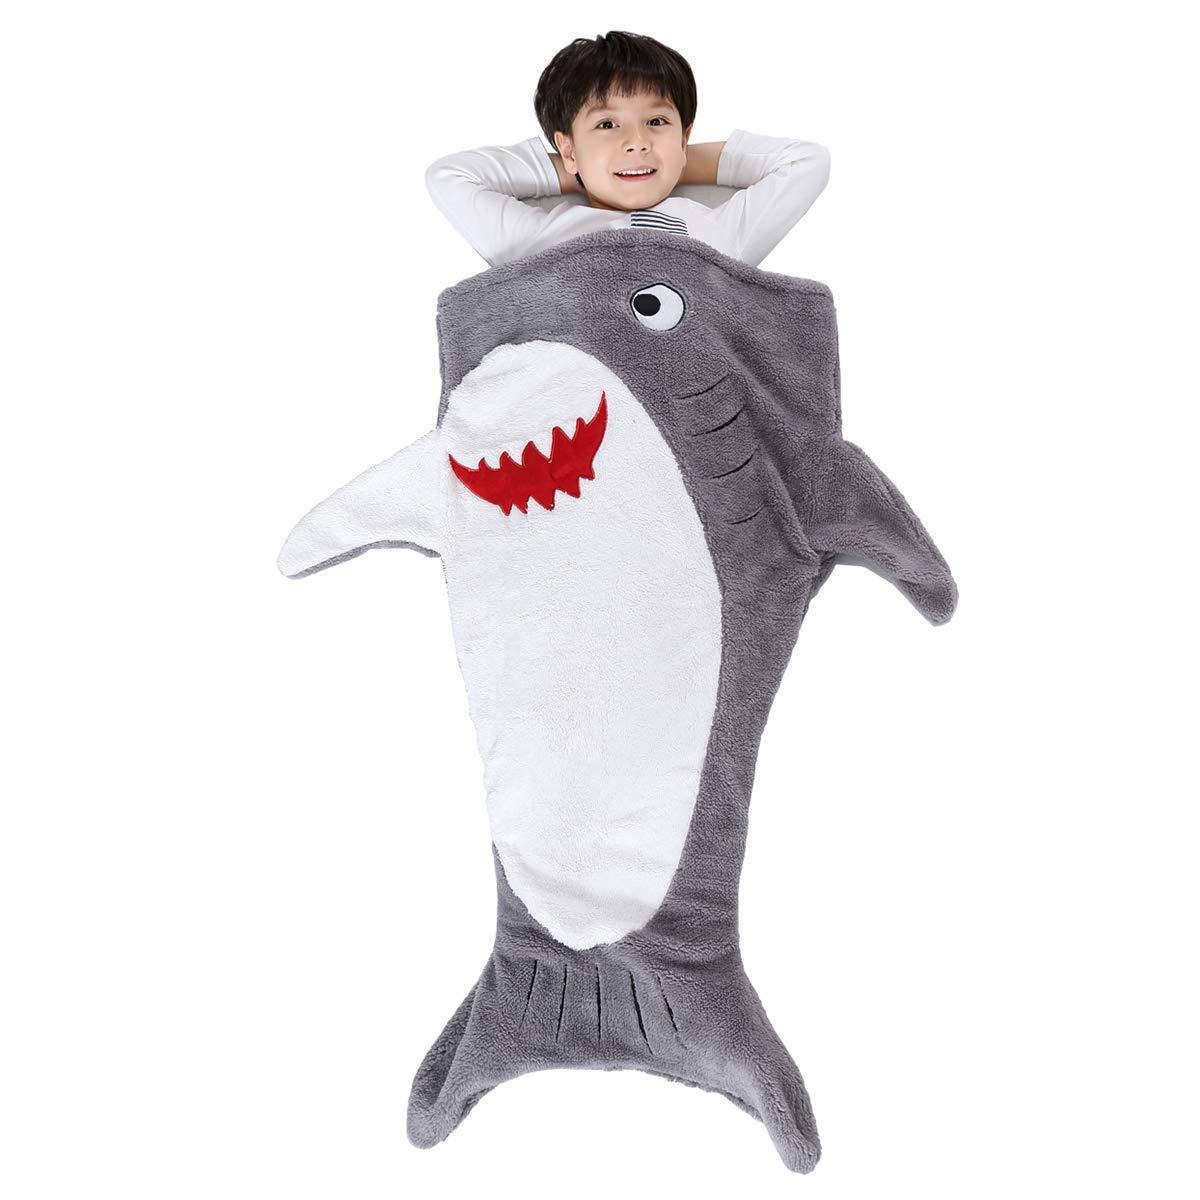 SINOGEM Shark Tail Blanket - Plush Animal Sleeping Bag Blanket Shark Toys for Kids by (Grey) by SINOGEM